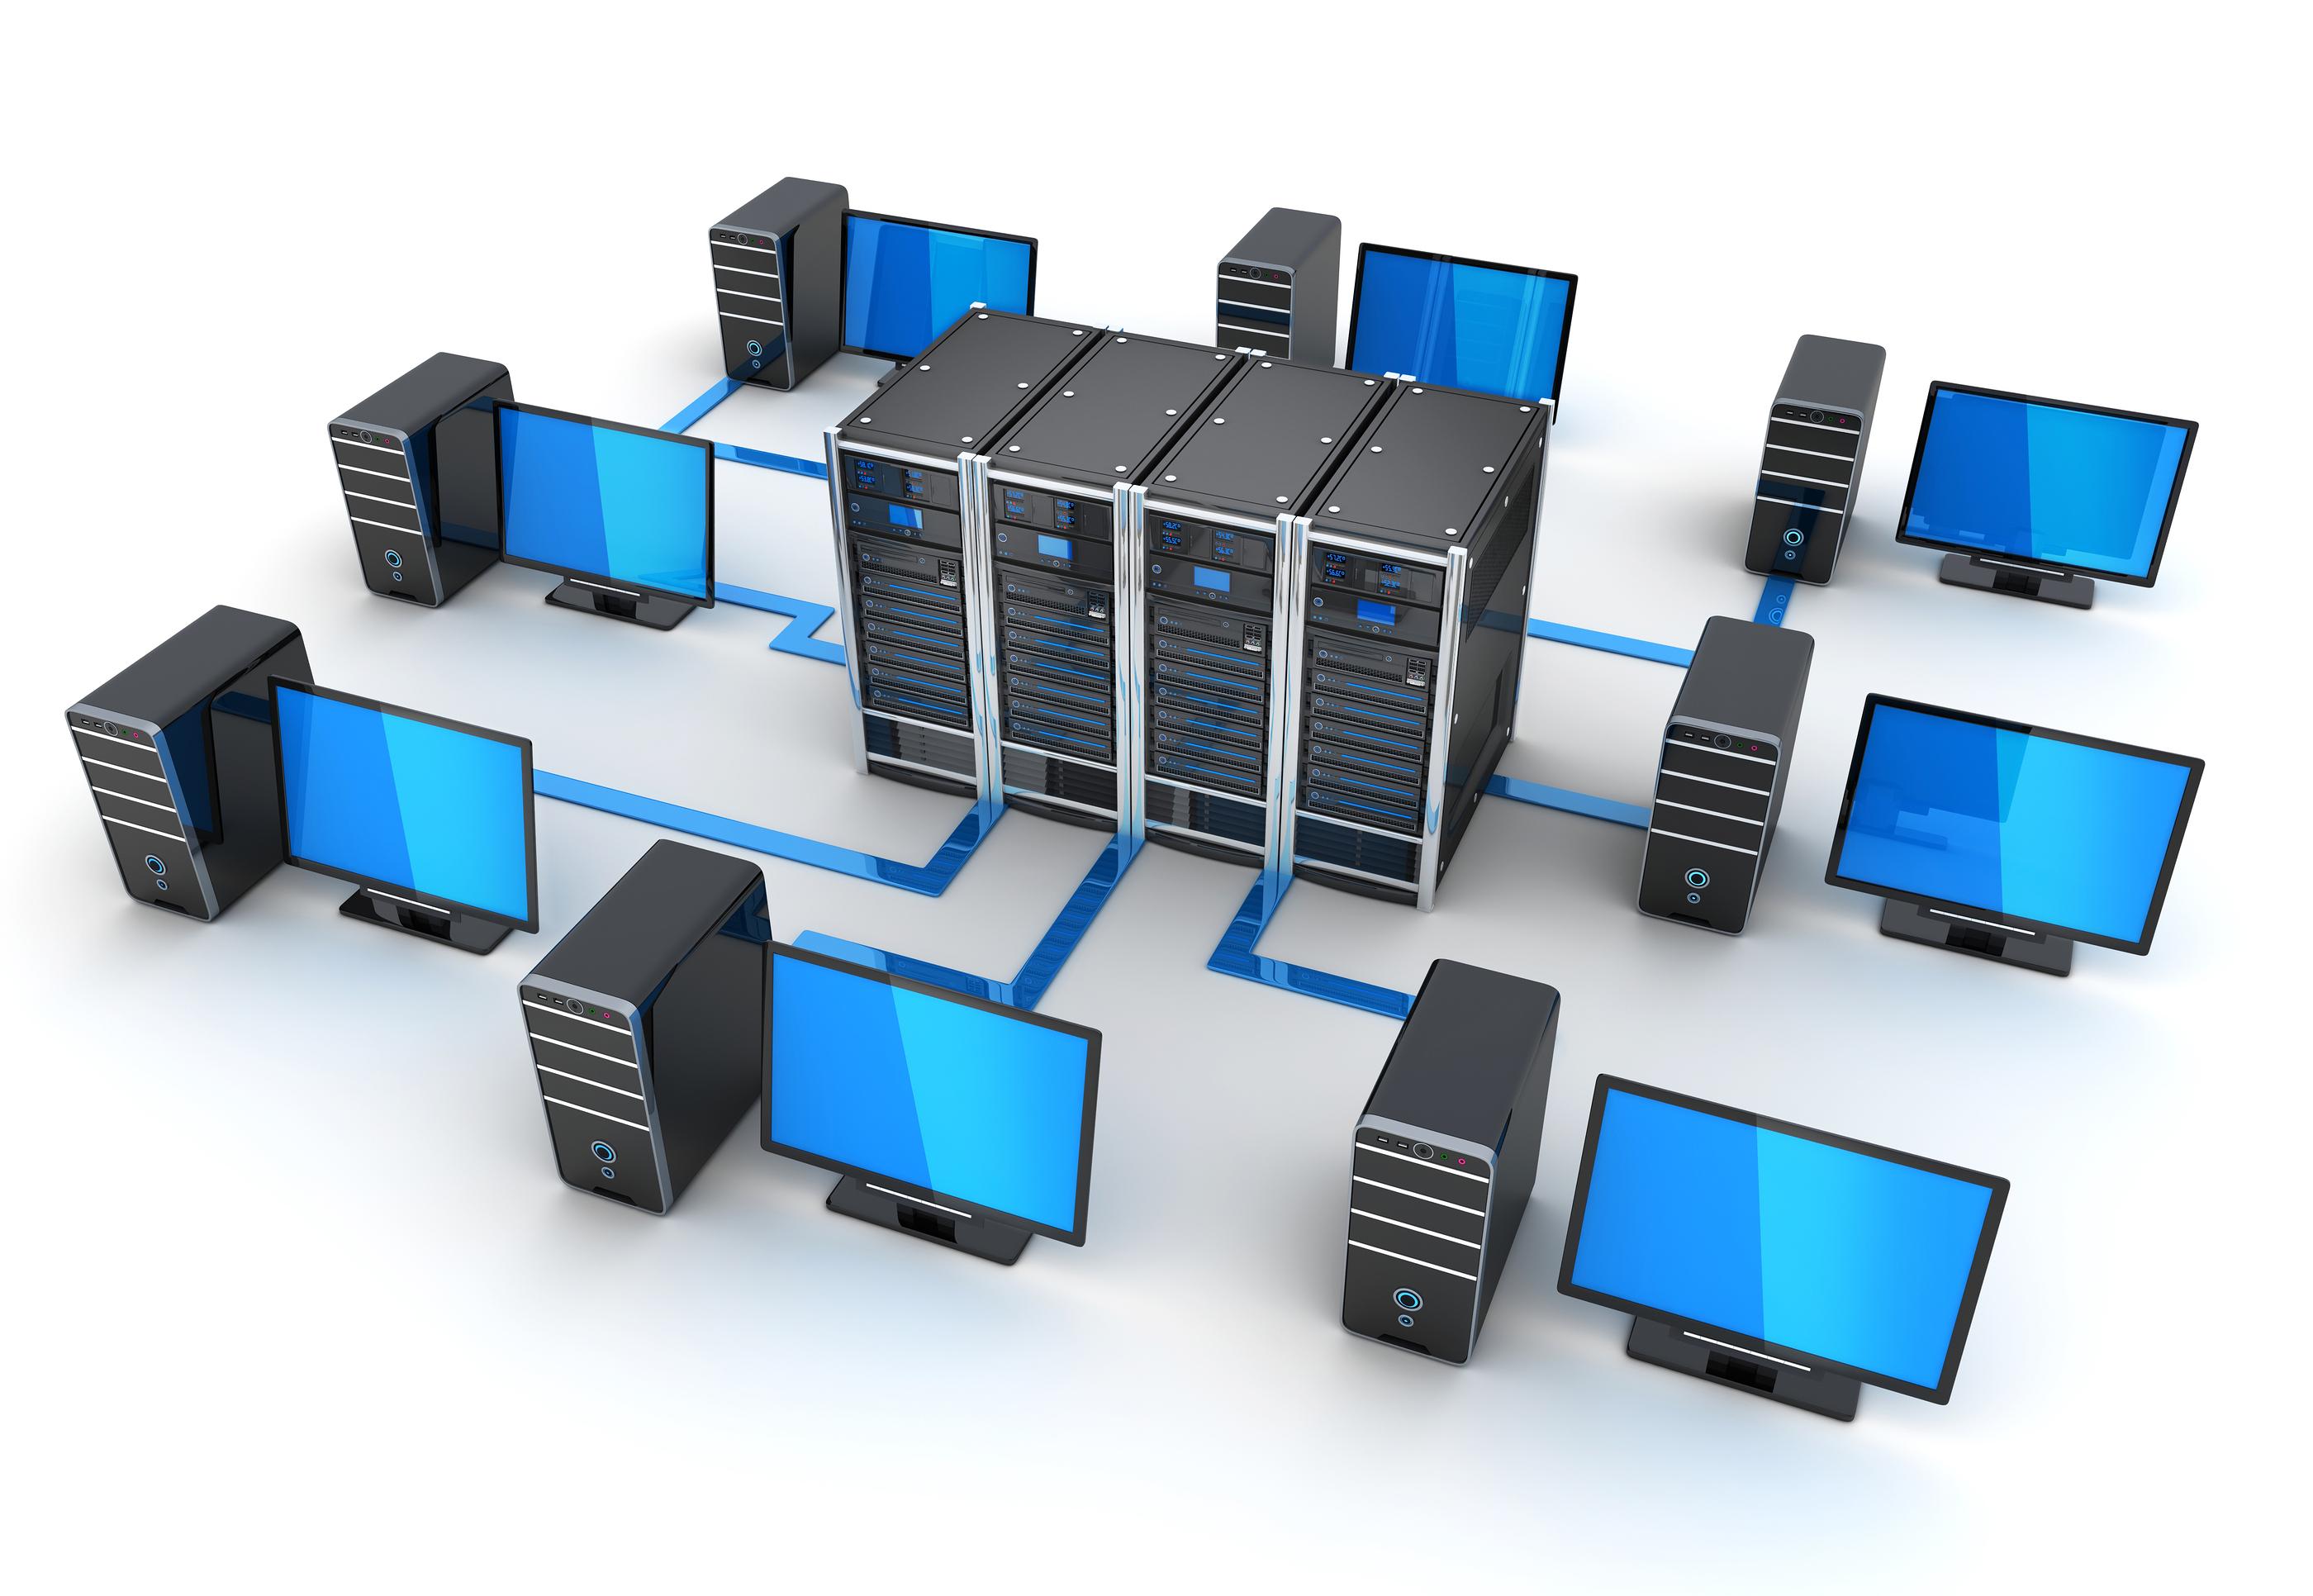 Red Intranet con equipos conectados a servidores.